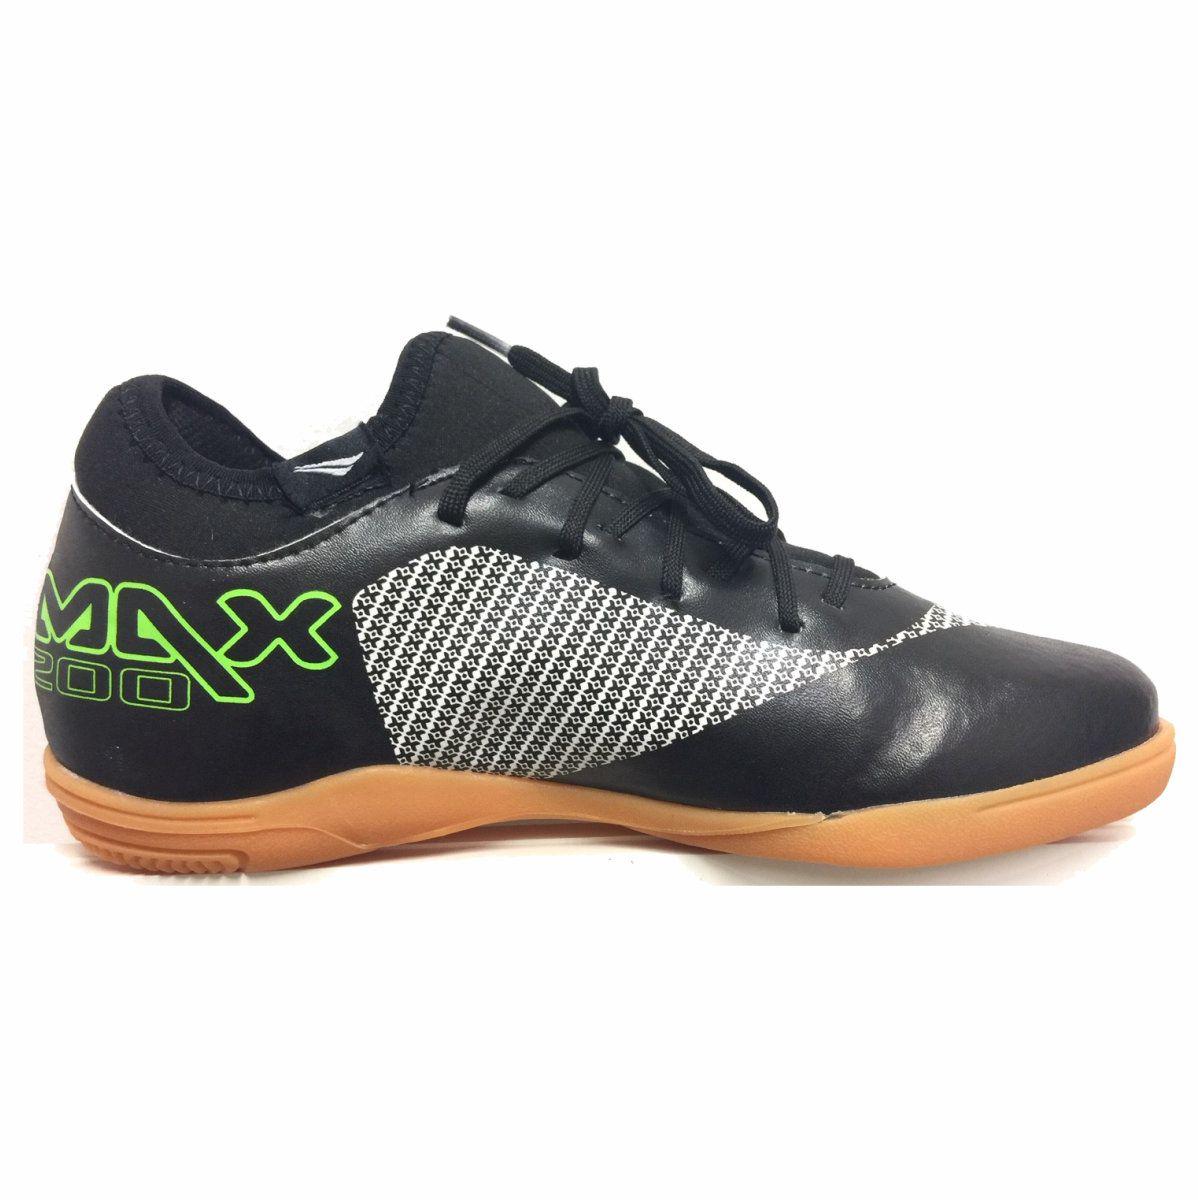 Tenis Penalty Max 200 Locker IX Futsal Infantil